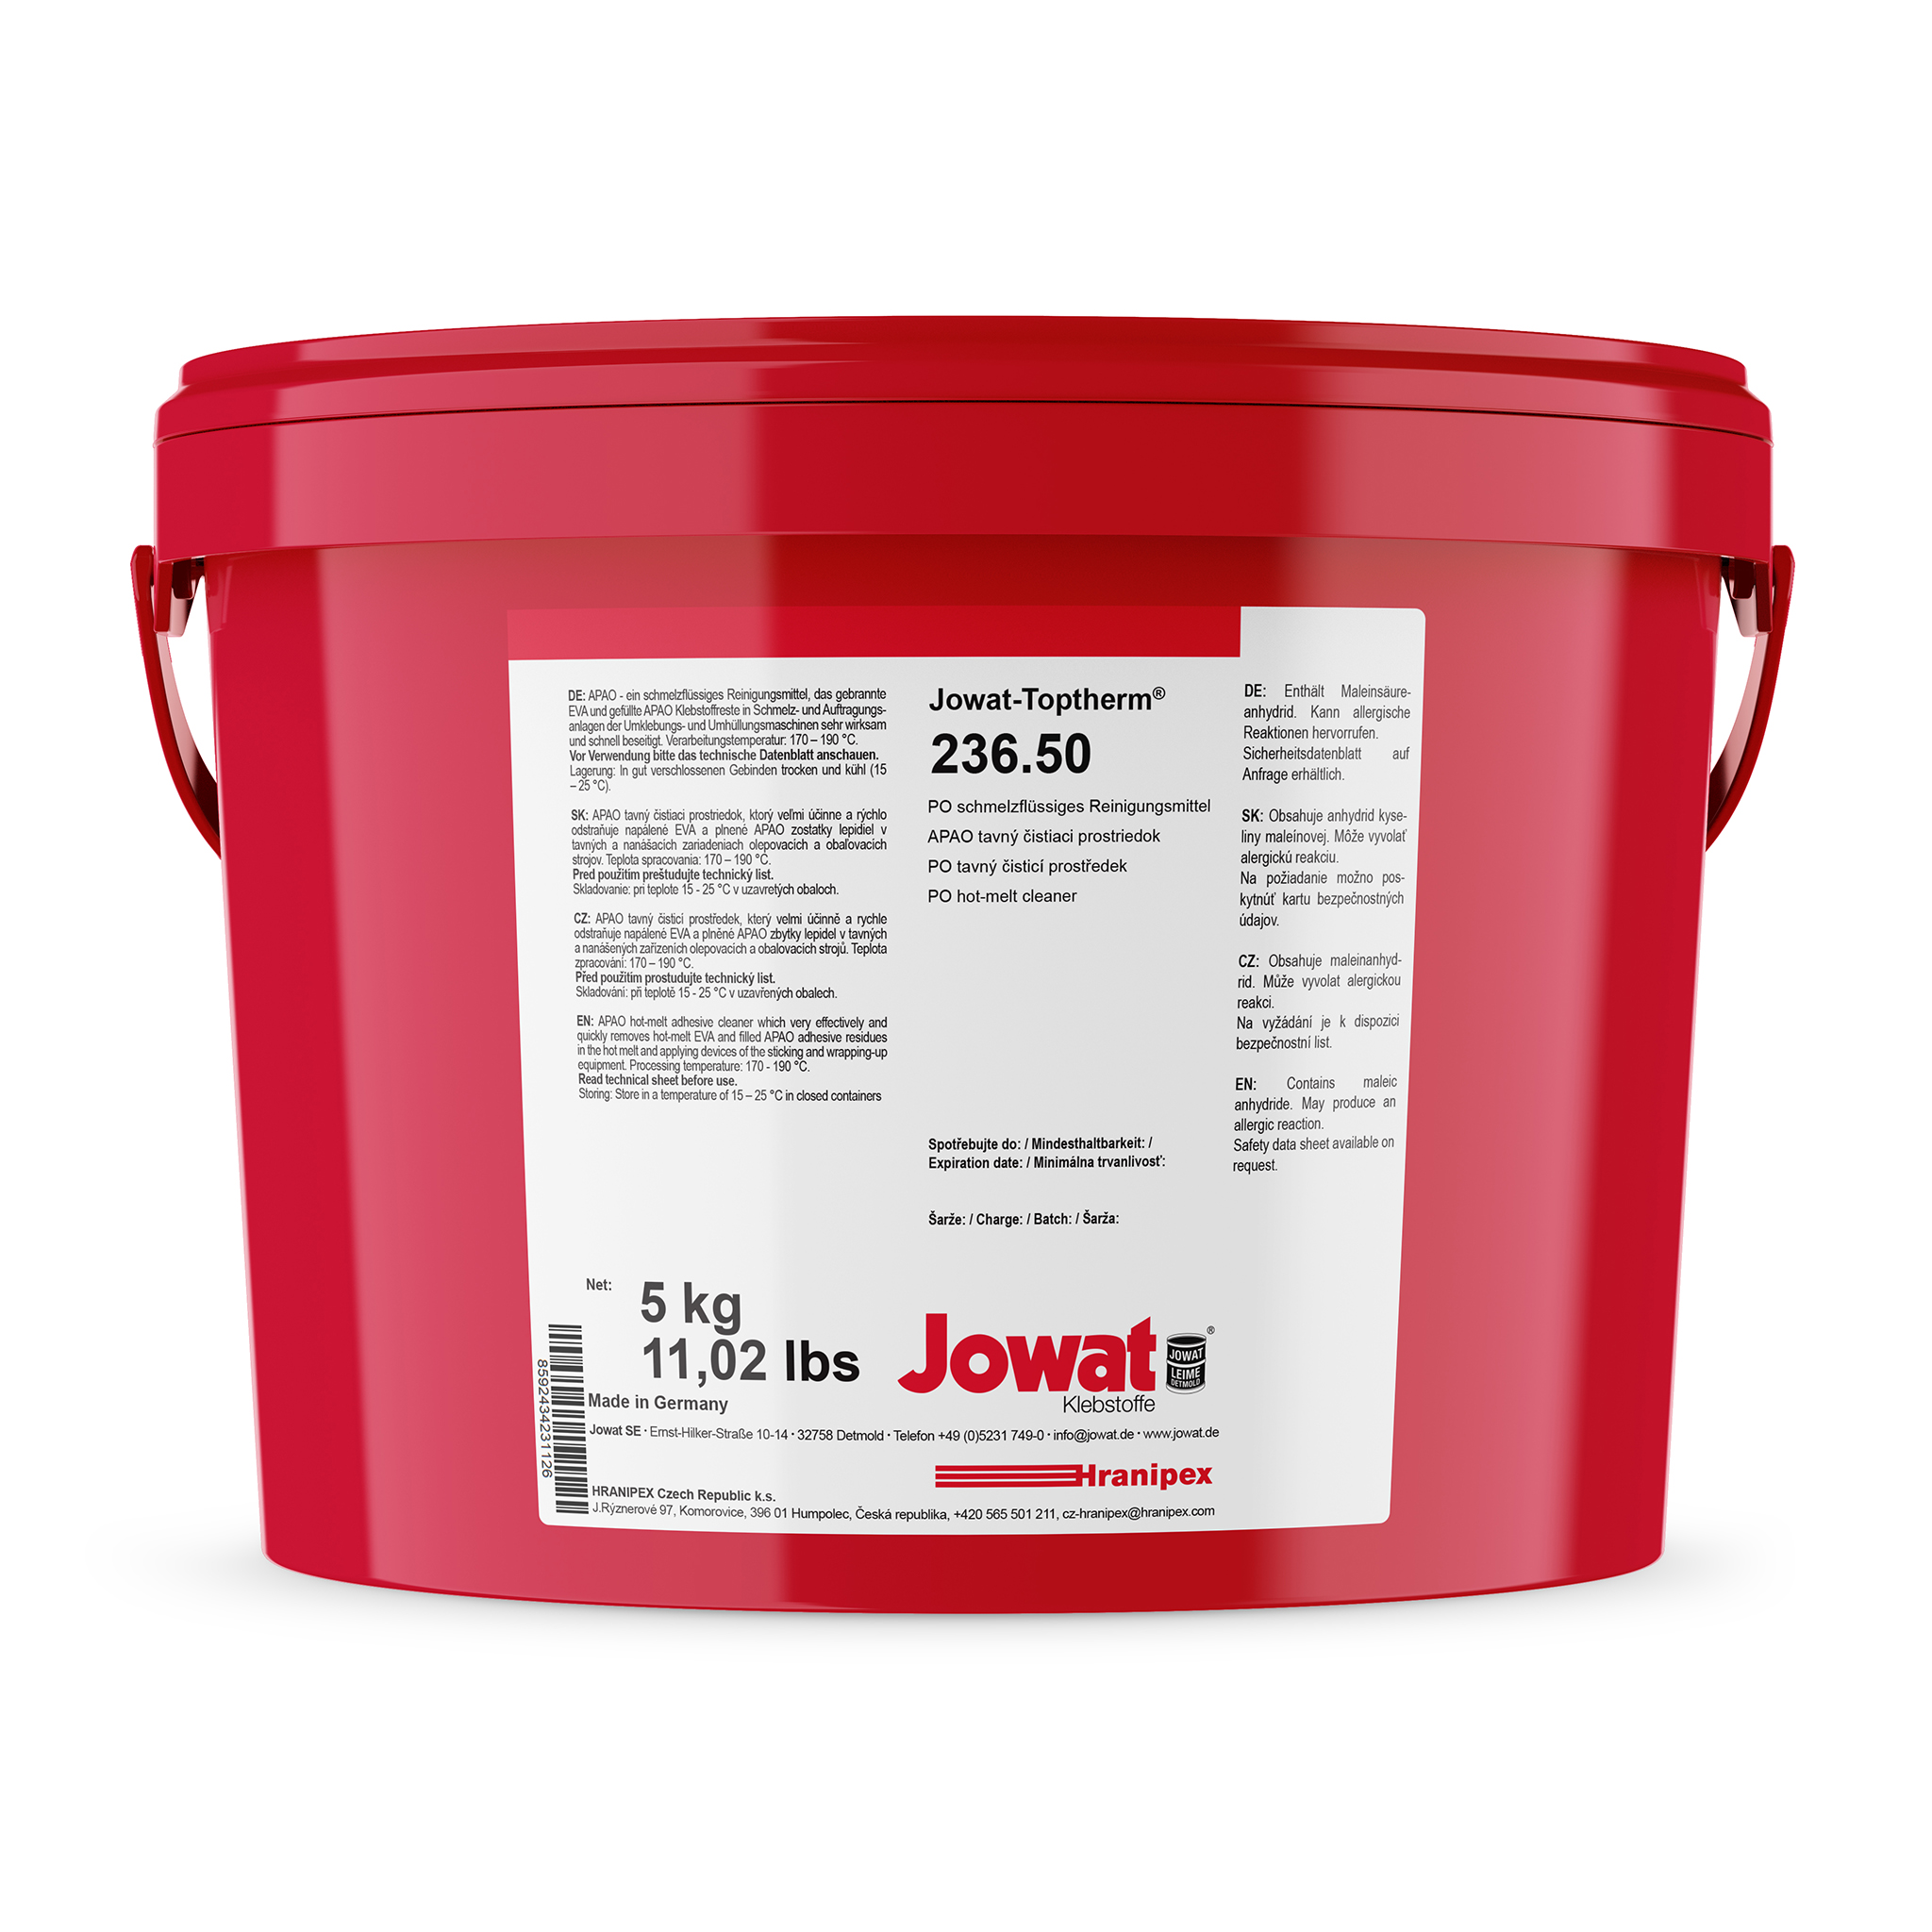 JOWATHERM 236.50 - Polyolefin